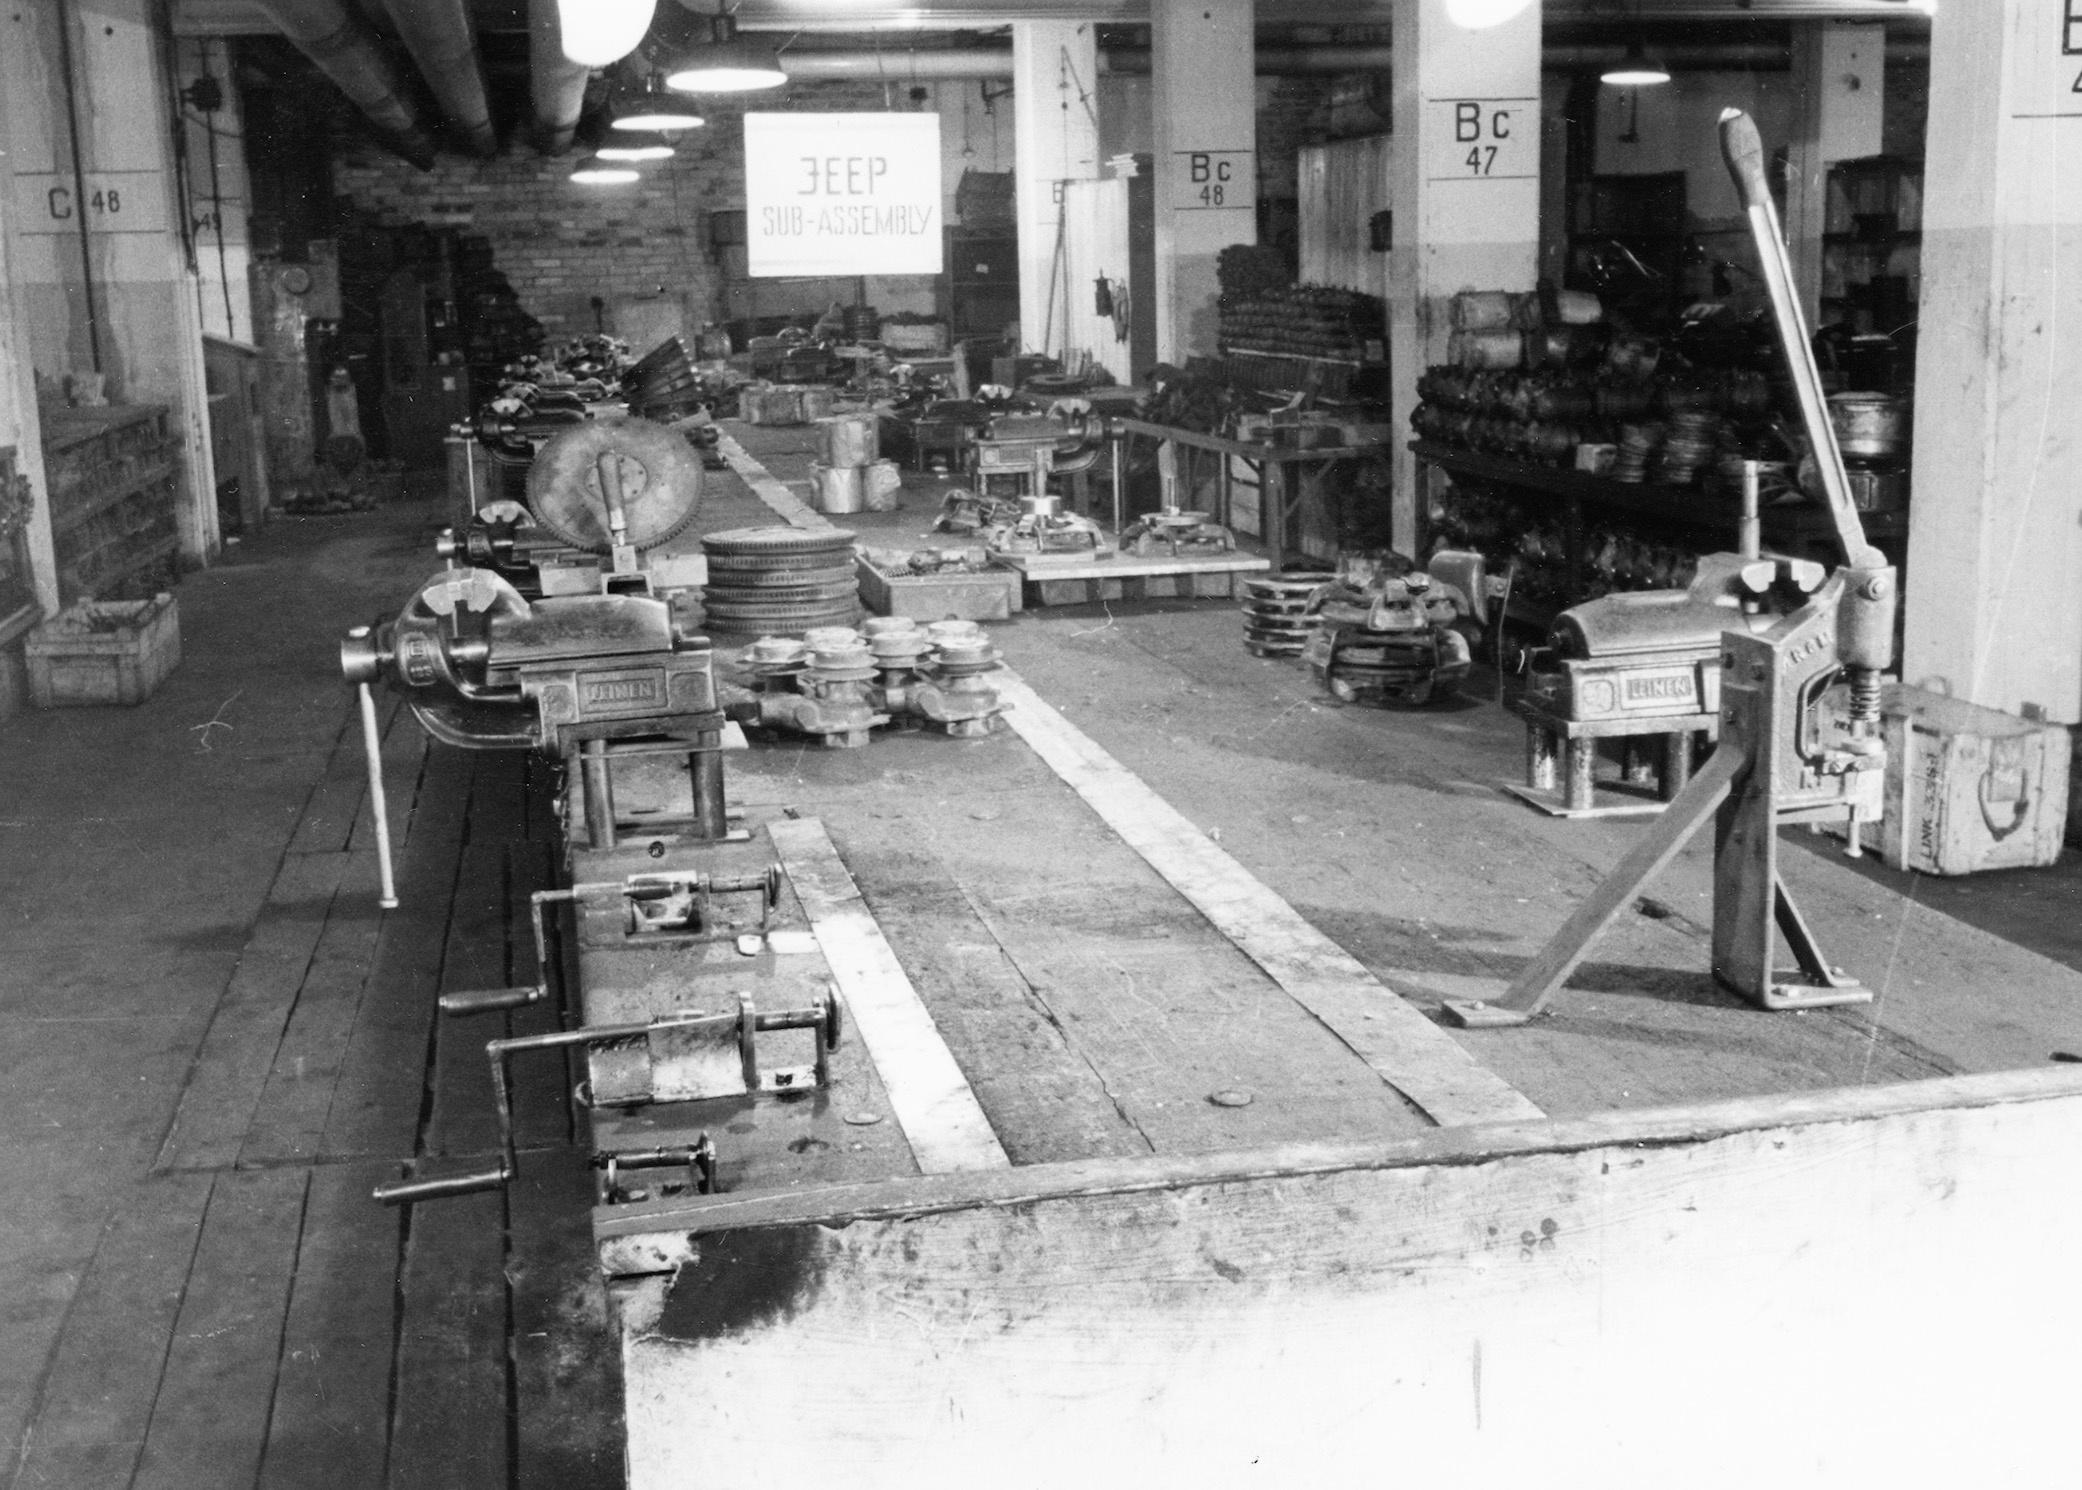 British take over Volkswagen 1945 - Repair shop